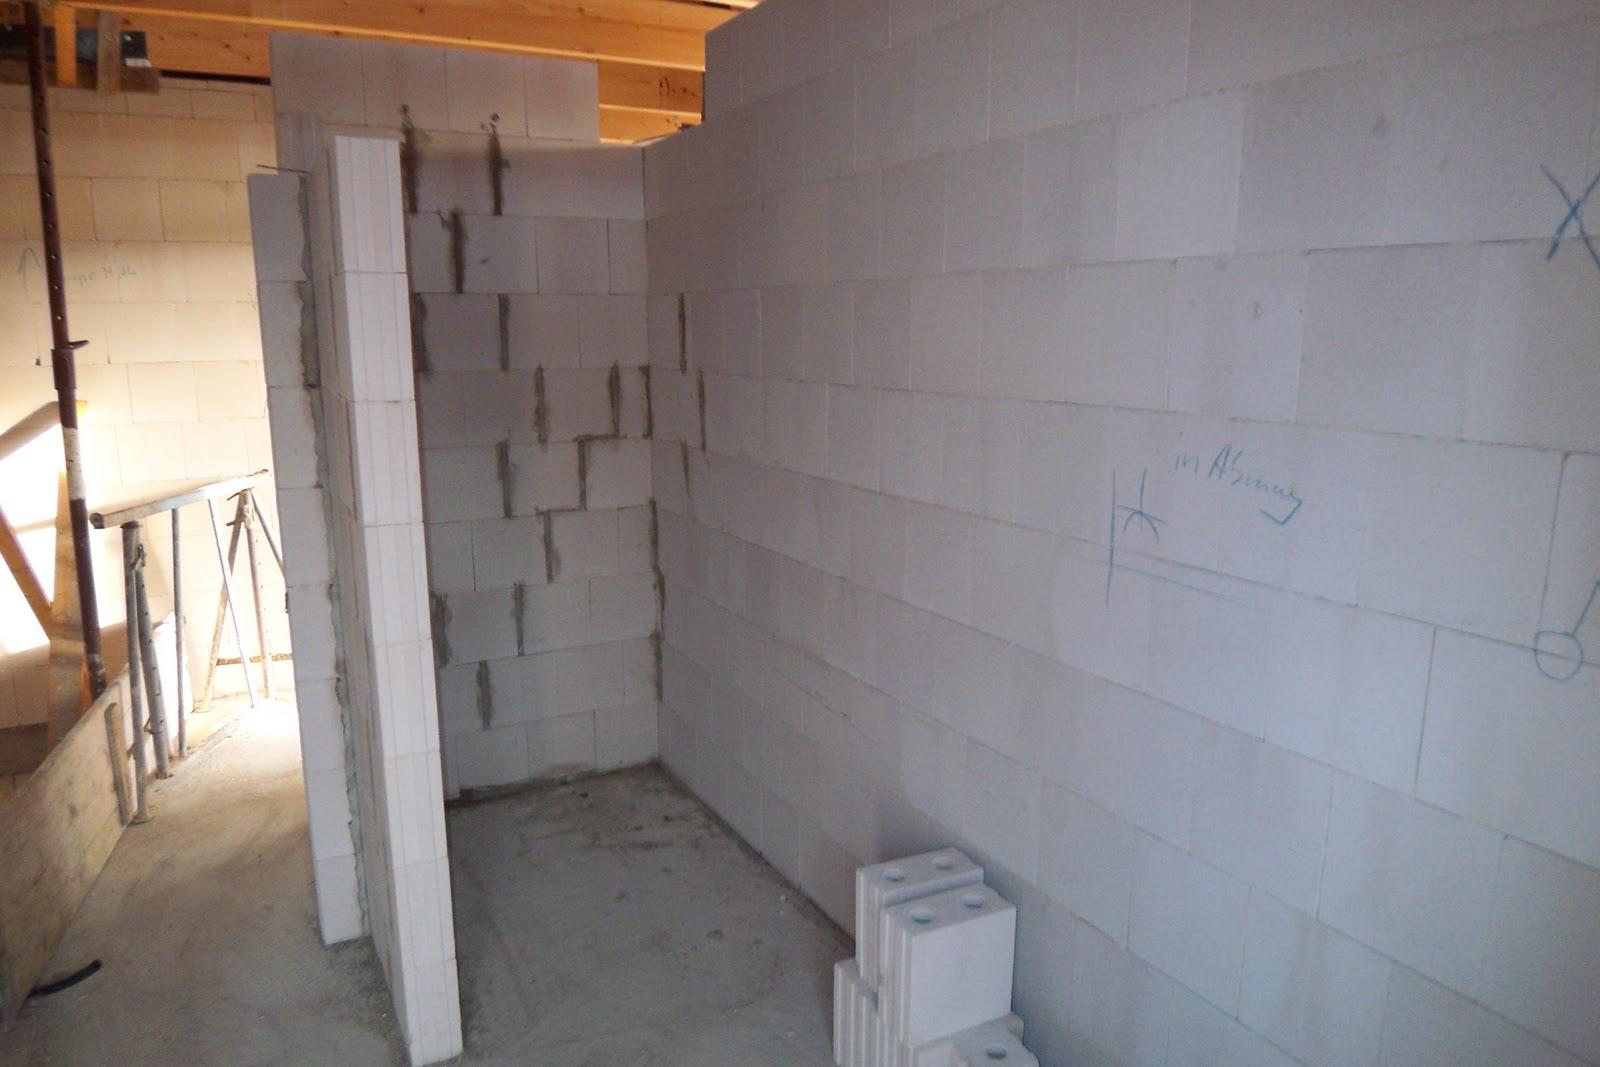 dusche selber bauen latest begehbare dusche selber bauen with dusche selber bauen excellent. Black Bedroom Furniture Sets. Home Design Ideas